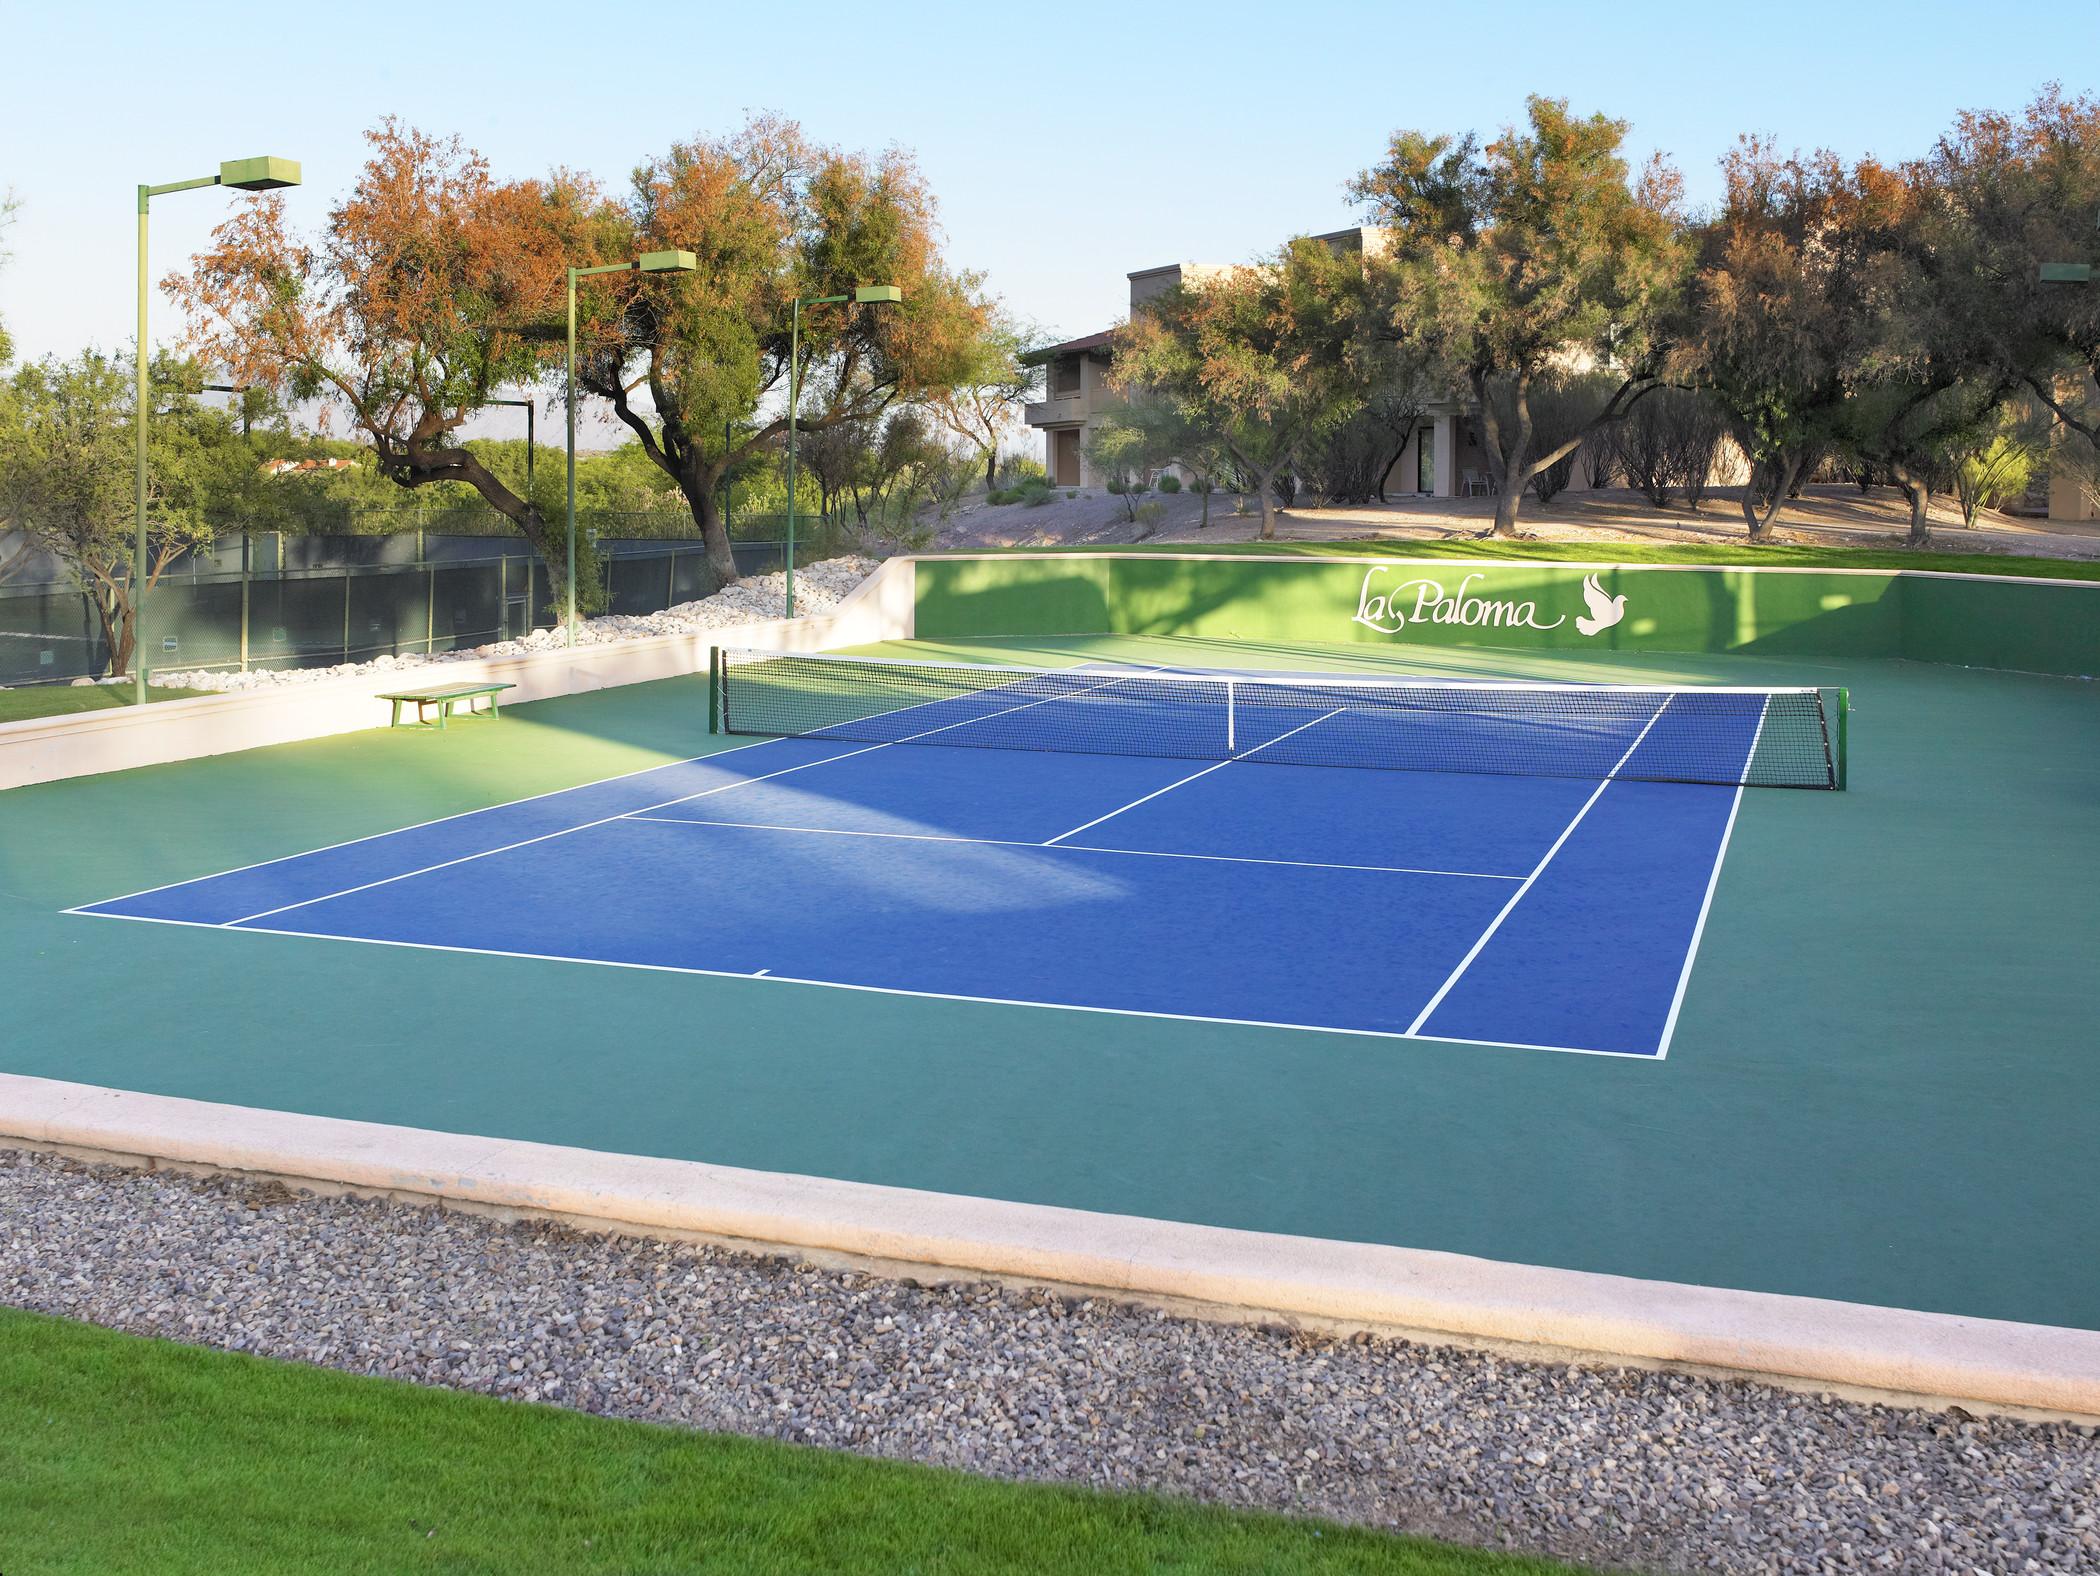 wes1001ag-106134-Tennis Courts-Med.jpg